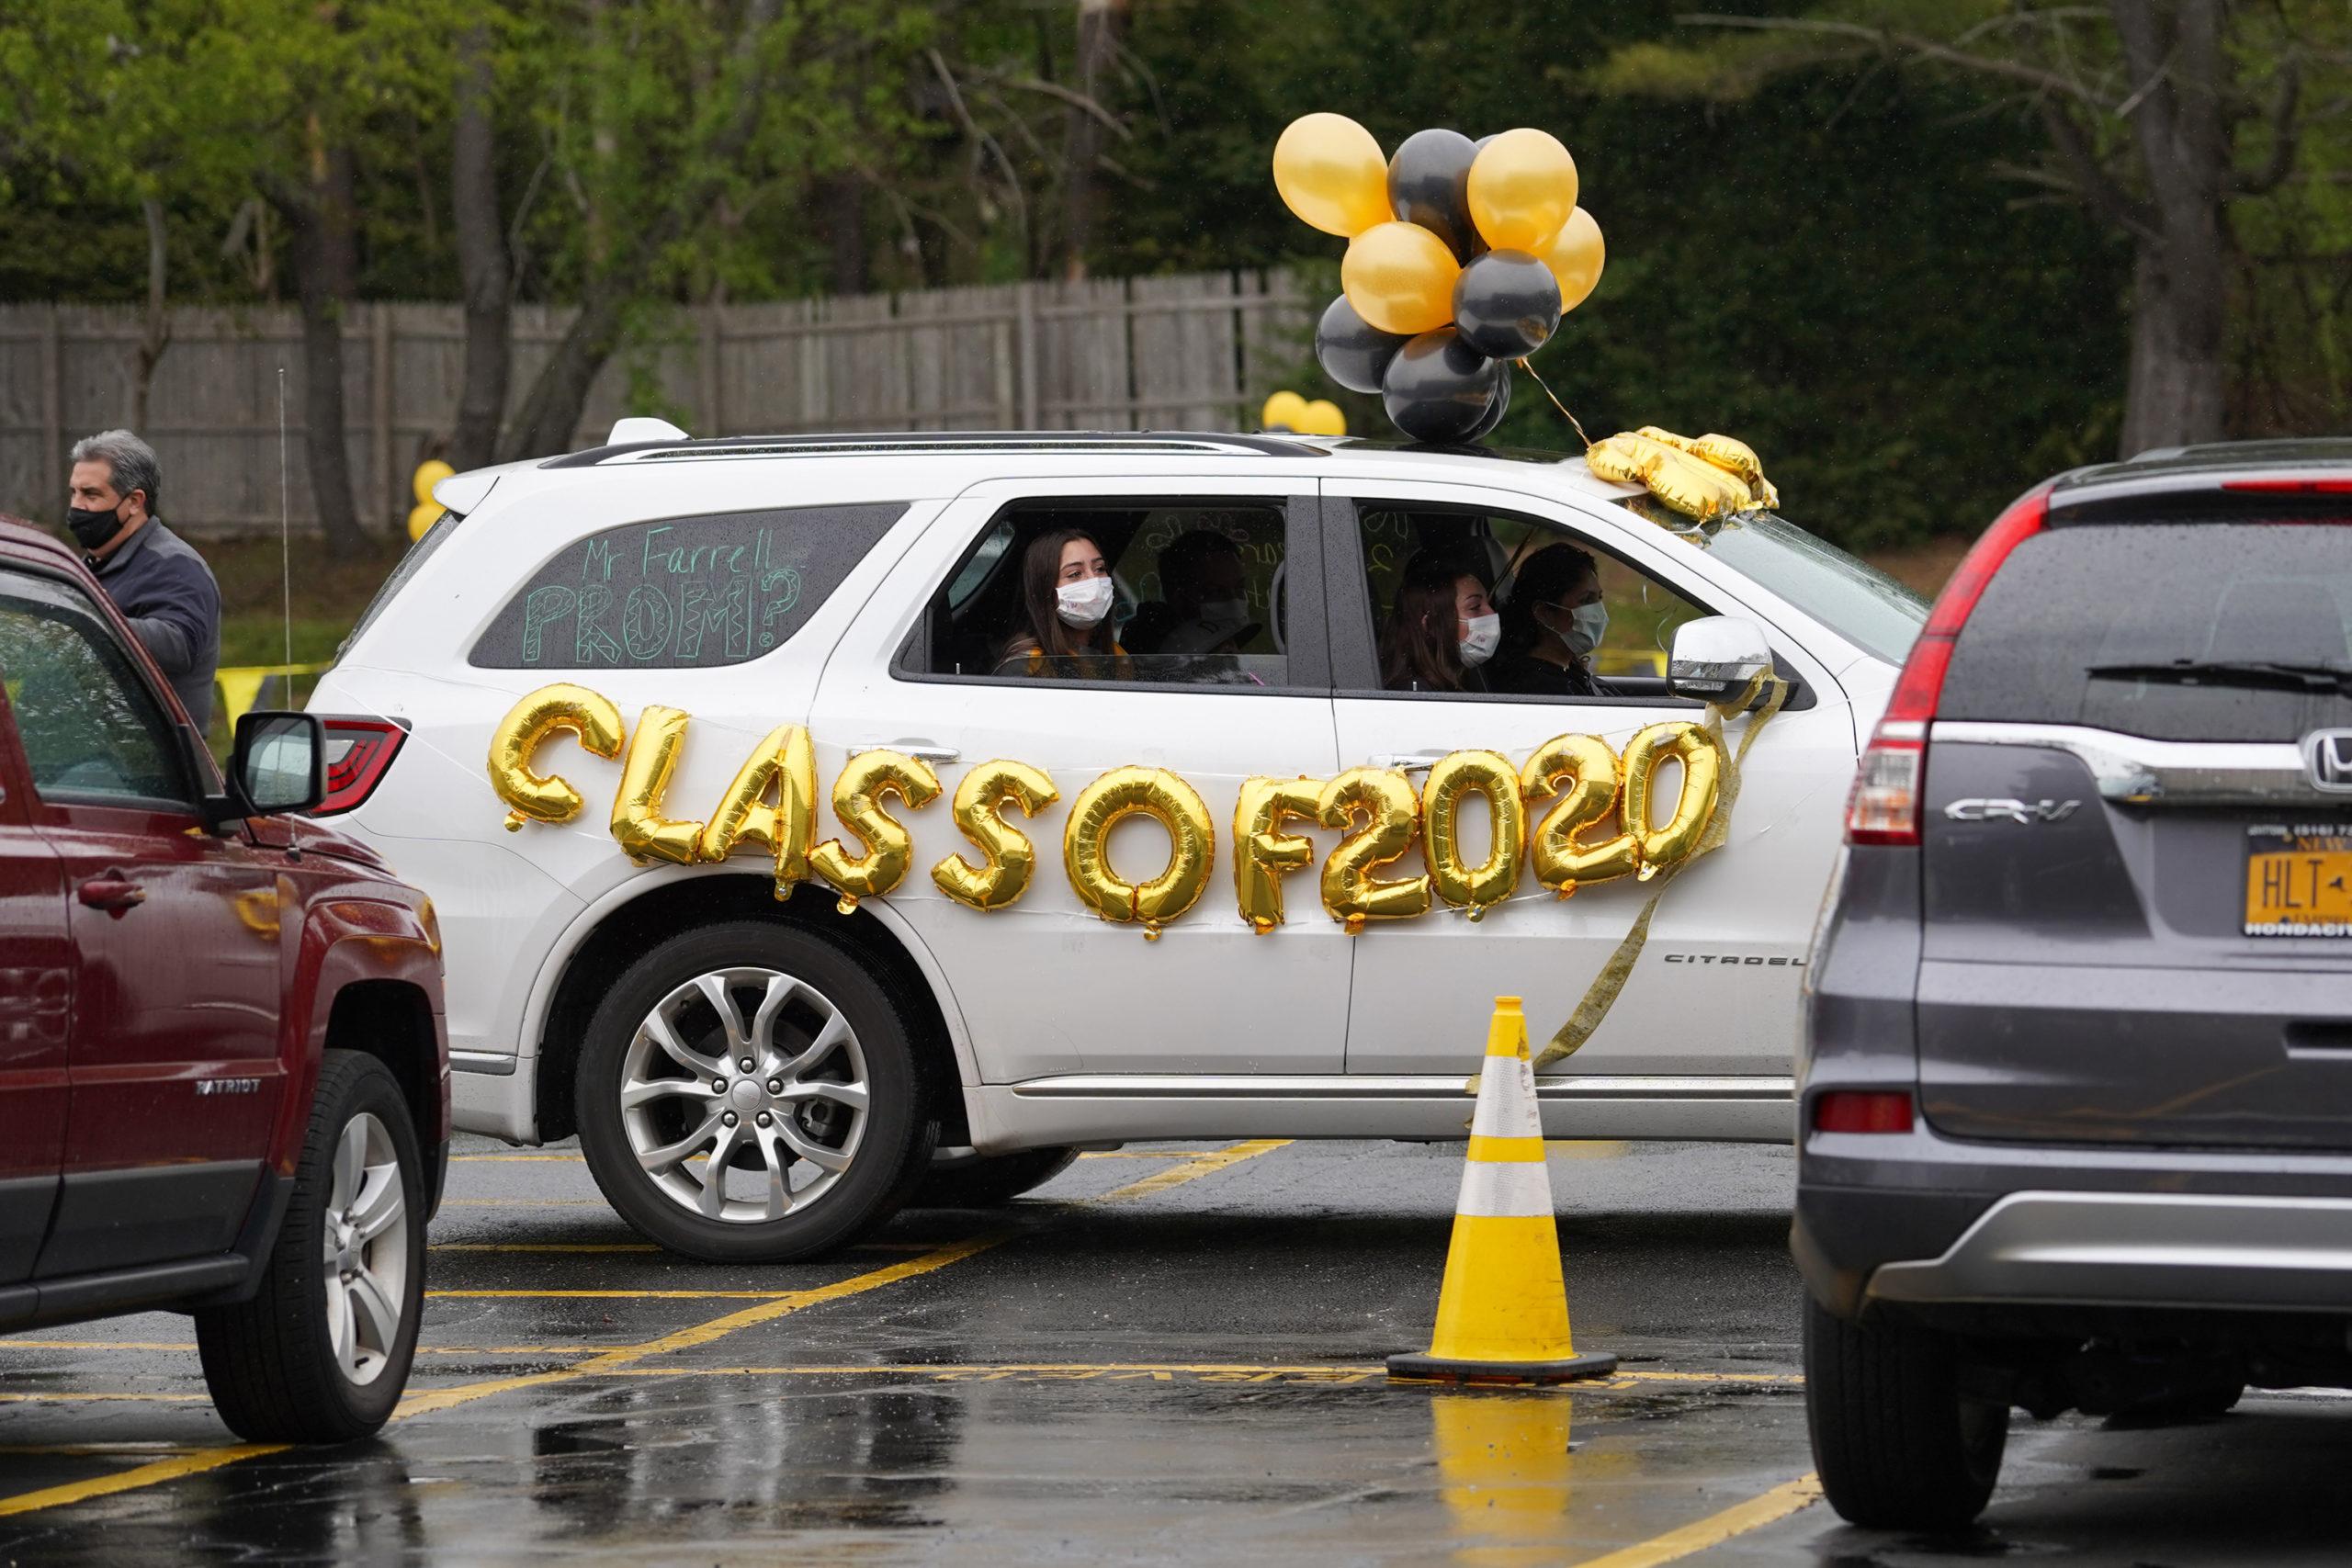 2020 Wilmington High School Christmas Break Diocese of Wilmington high school graduations take many forms this